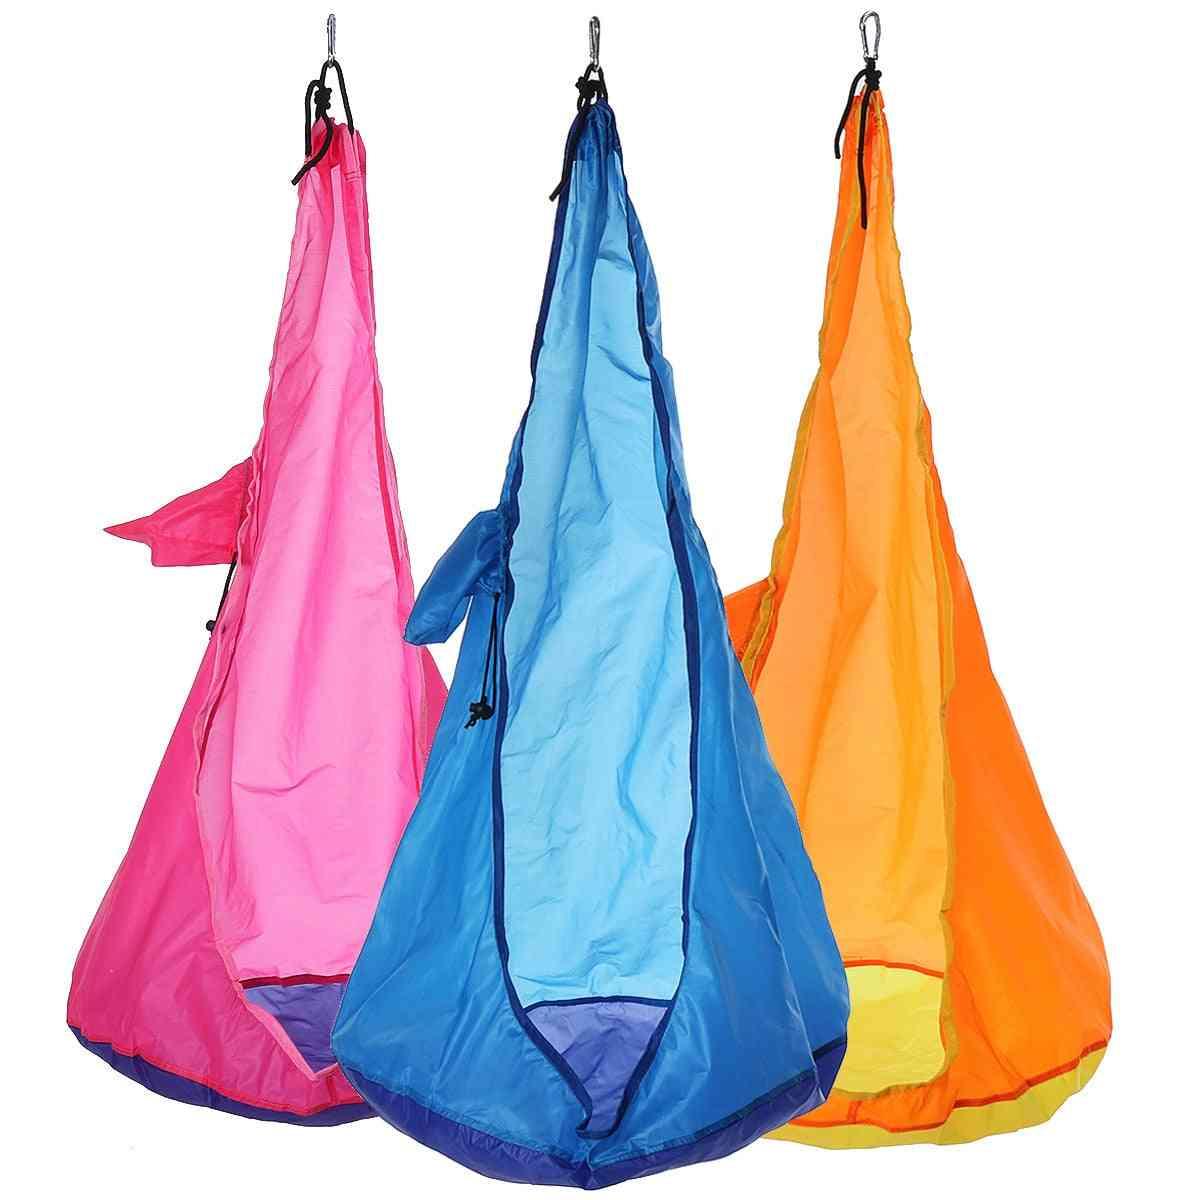 Portable Swing Home Hammock Chair Kids Swing Pods For Outdoor/indoor Hanging Seat